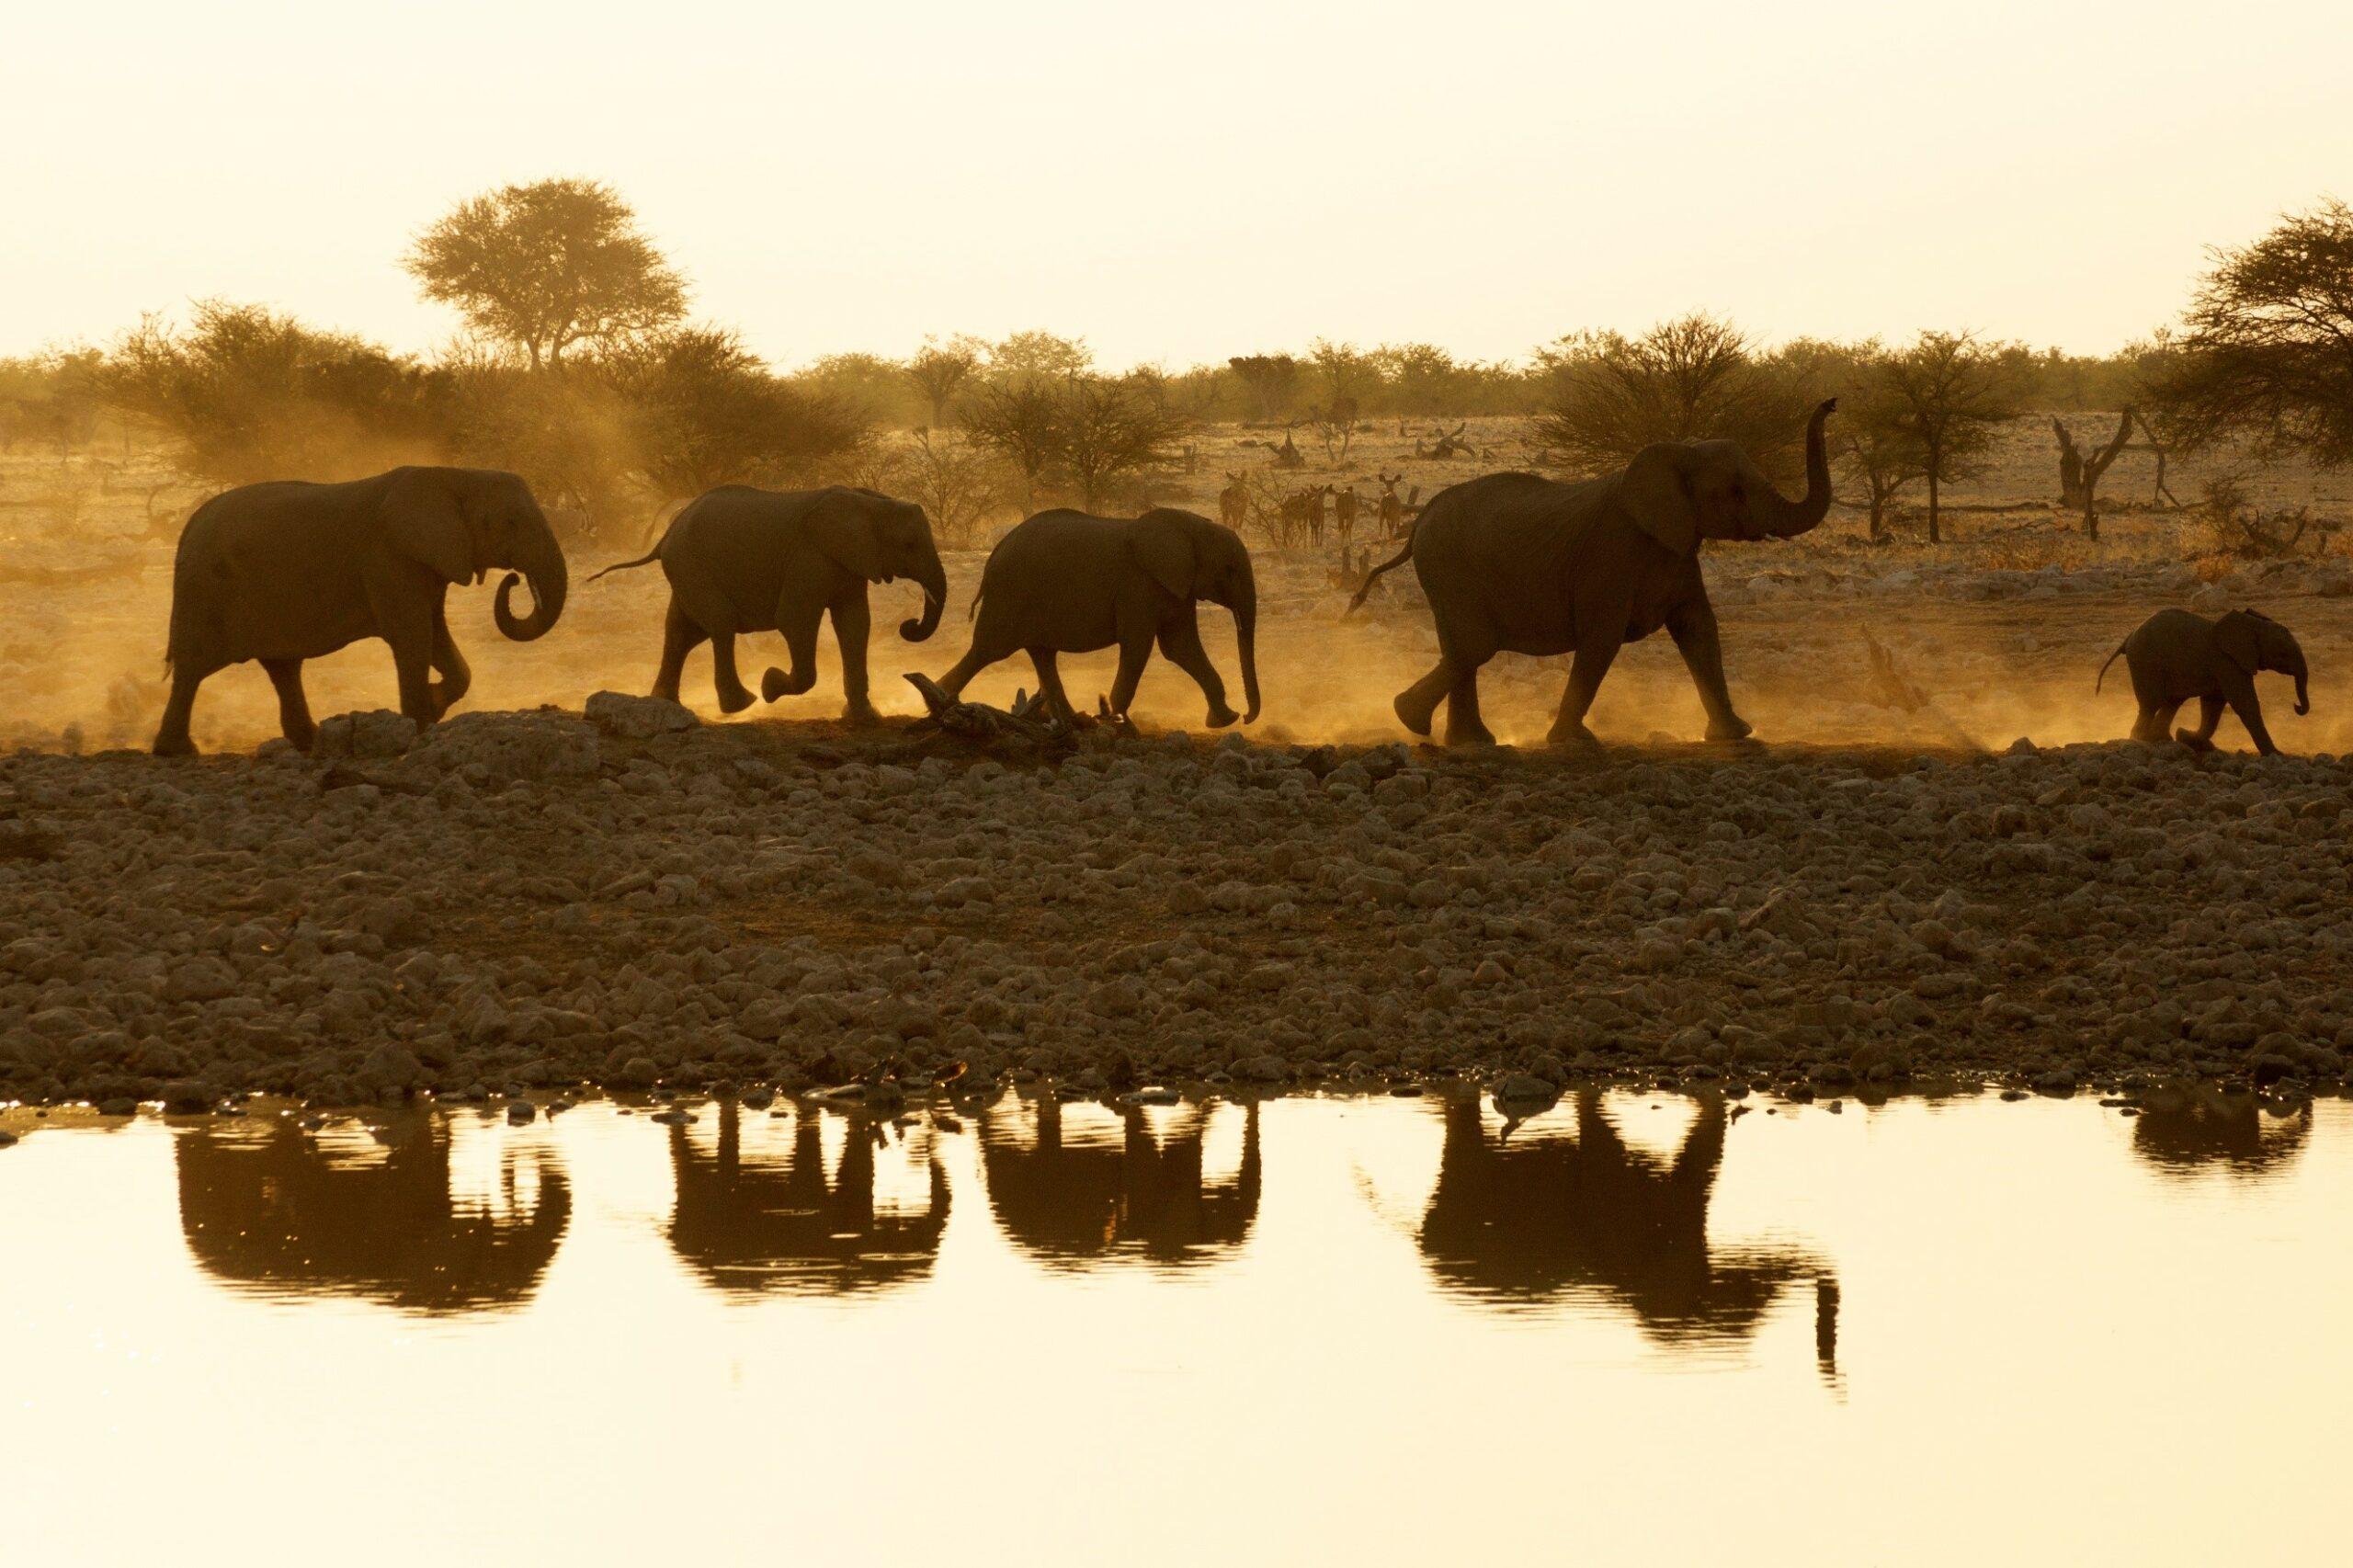 Namibia, Rundreise, Elefanten, Tierbeobachtung, Etoscha Nationalpark, Rotel Tours